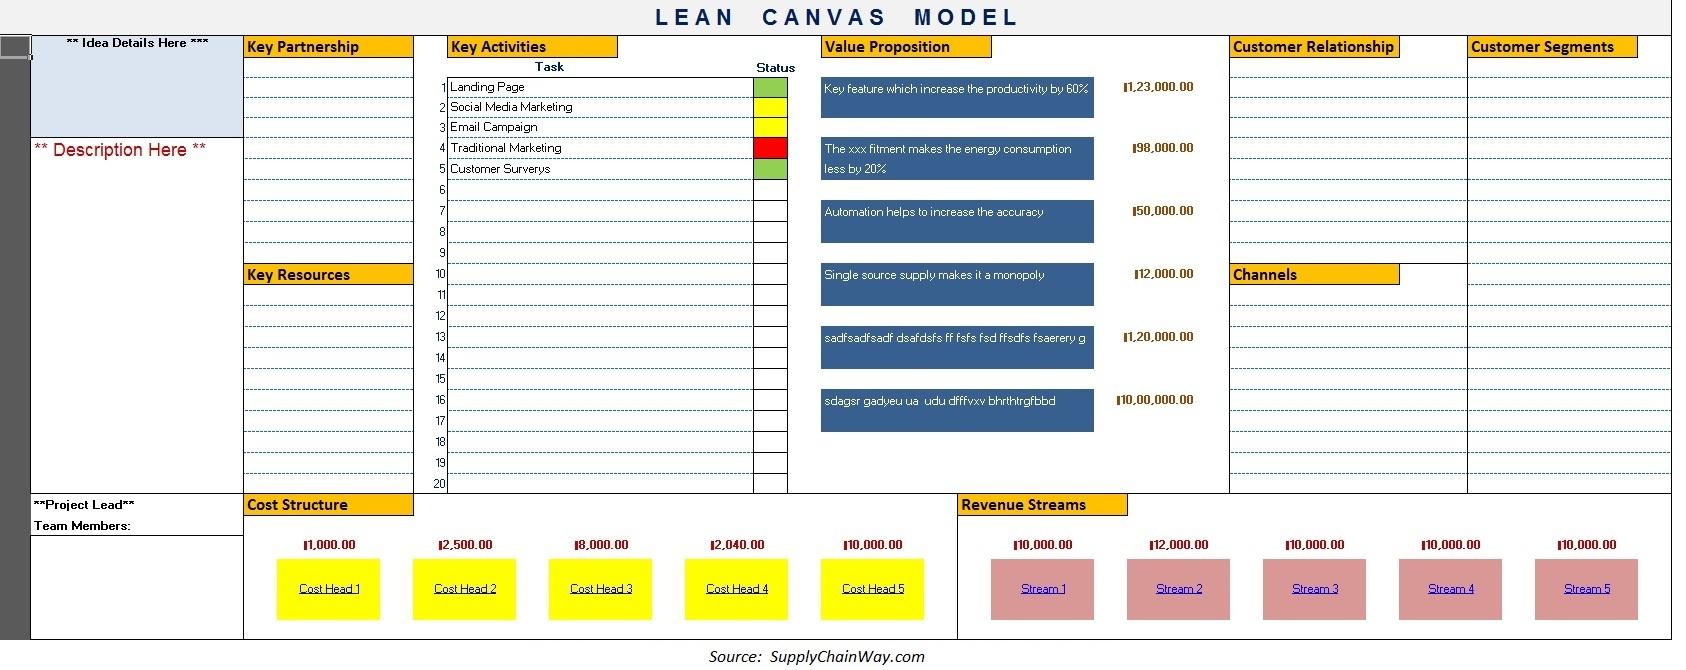 Lean Canvas Model for an Ireland based organization